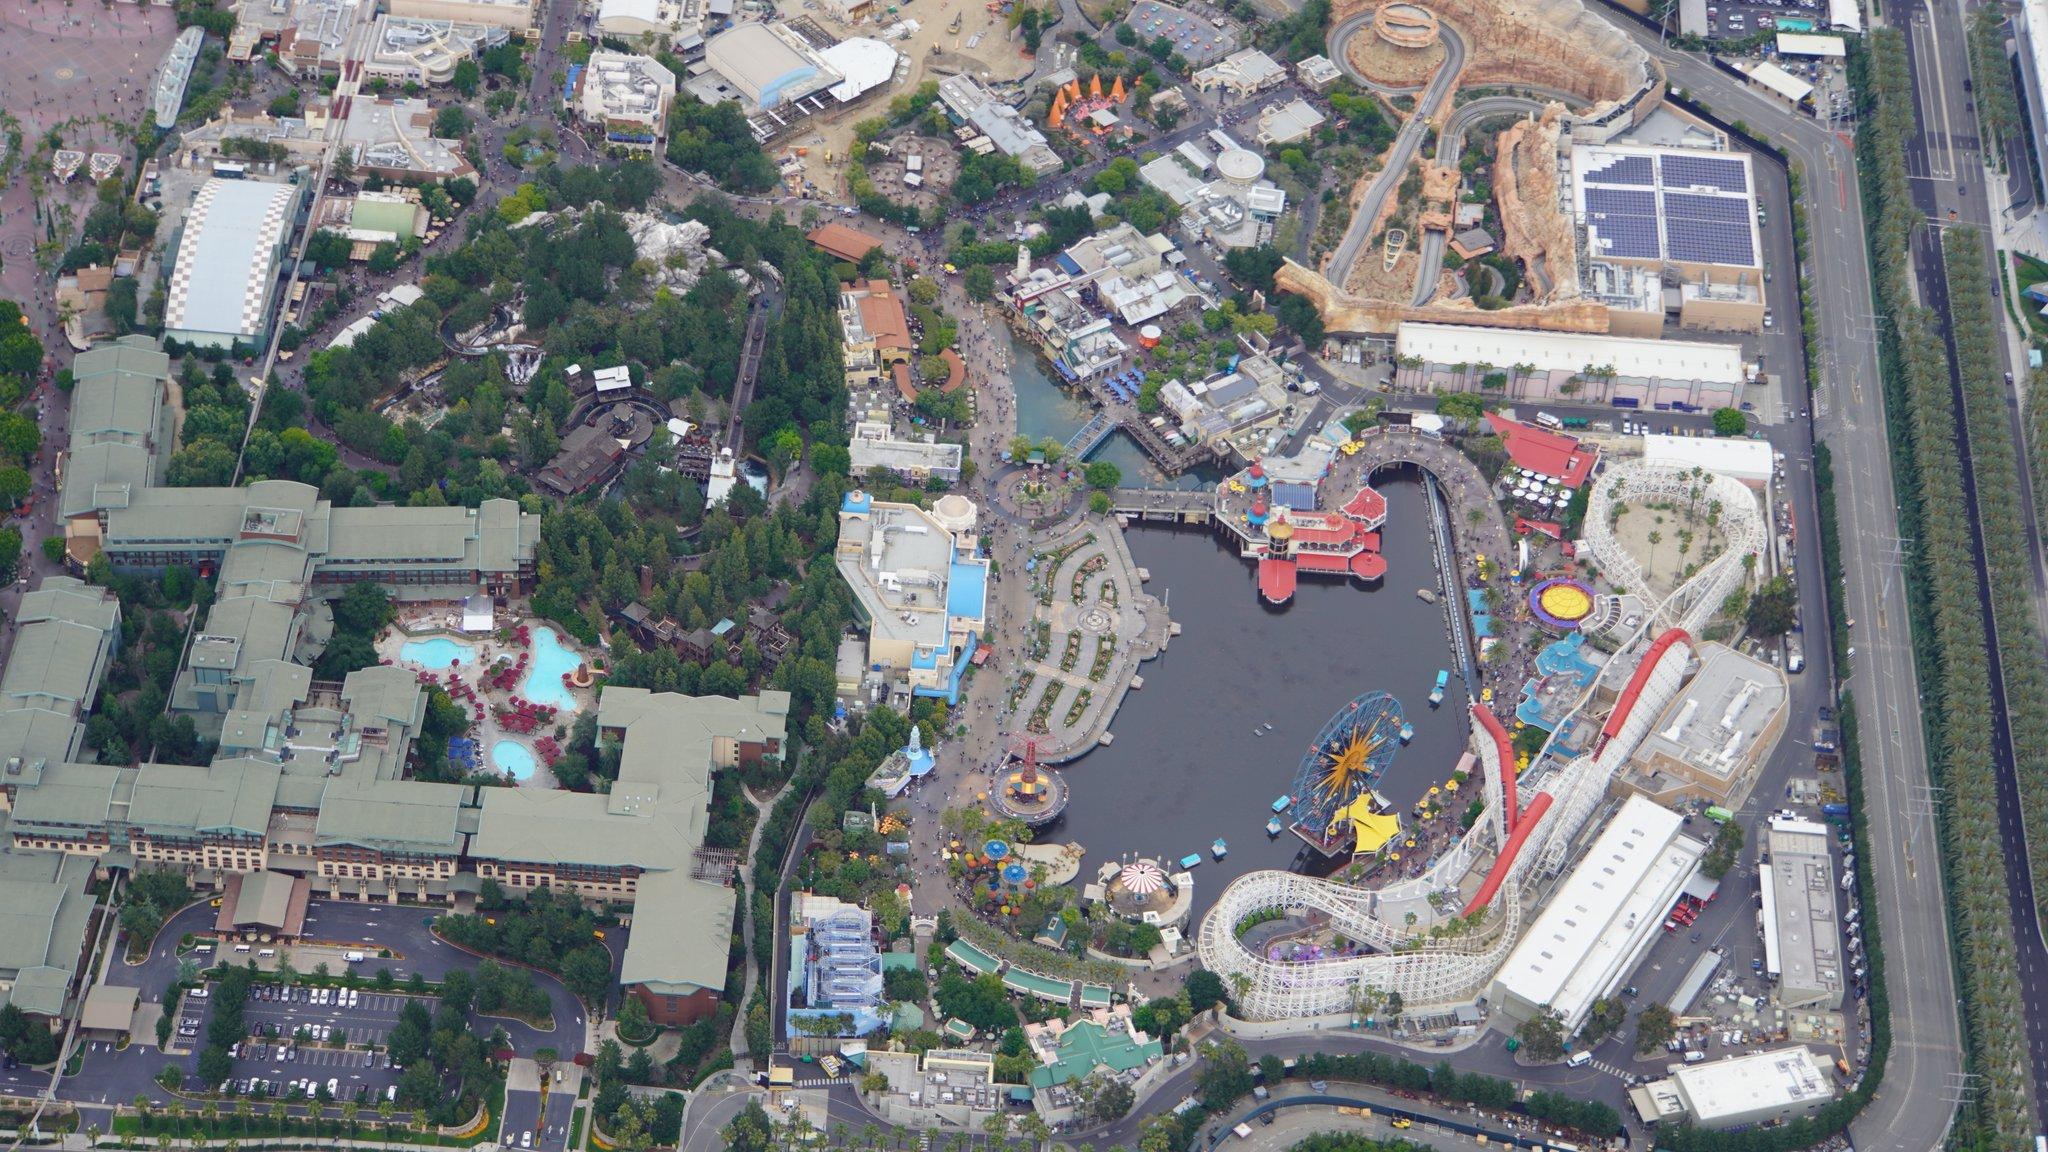 Disneyland Resort vu du ciel, des images sublimes! D6BKDC4UYAAq3Fu